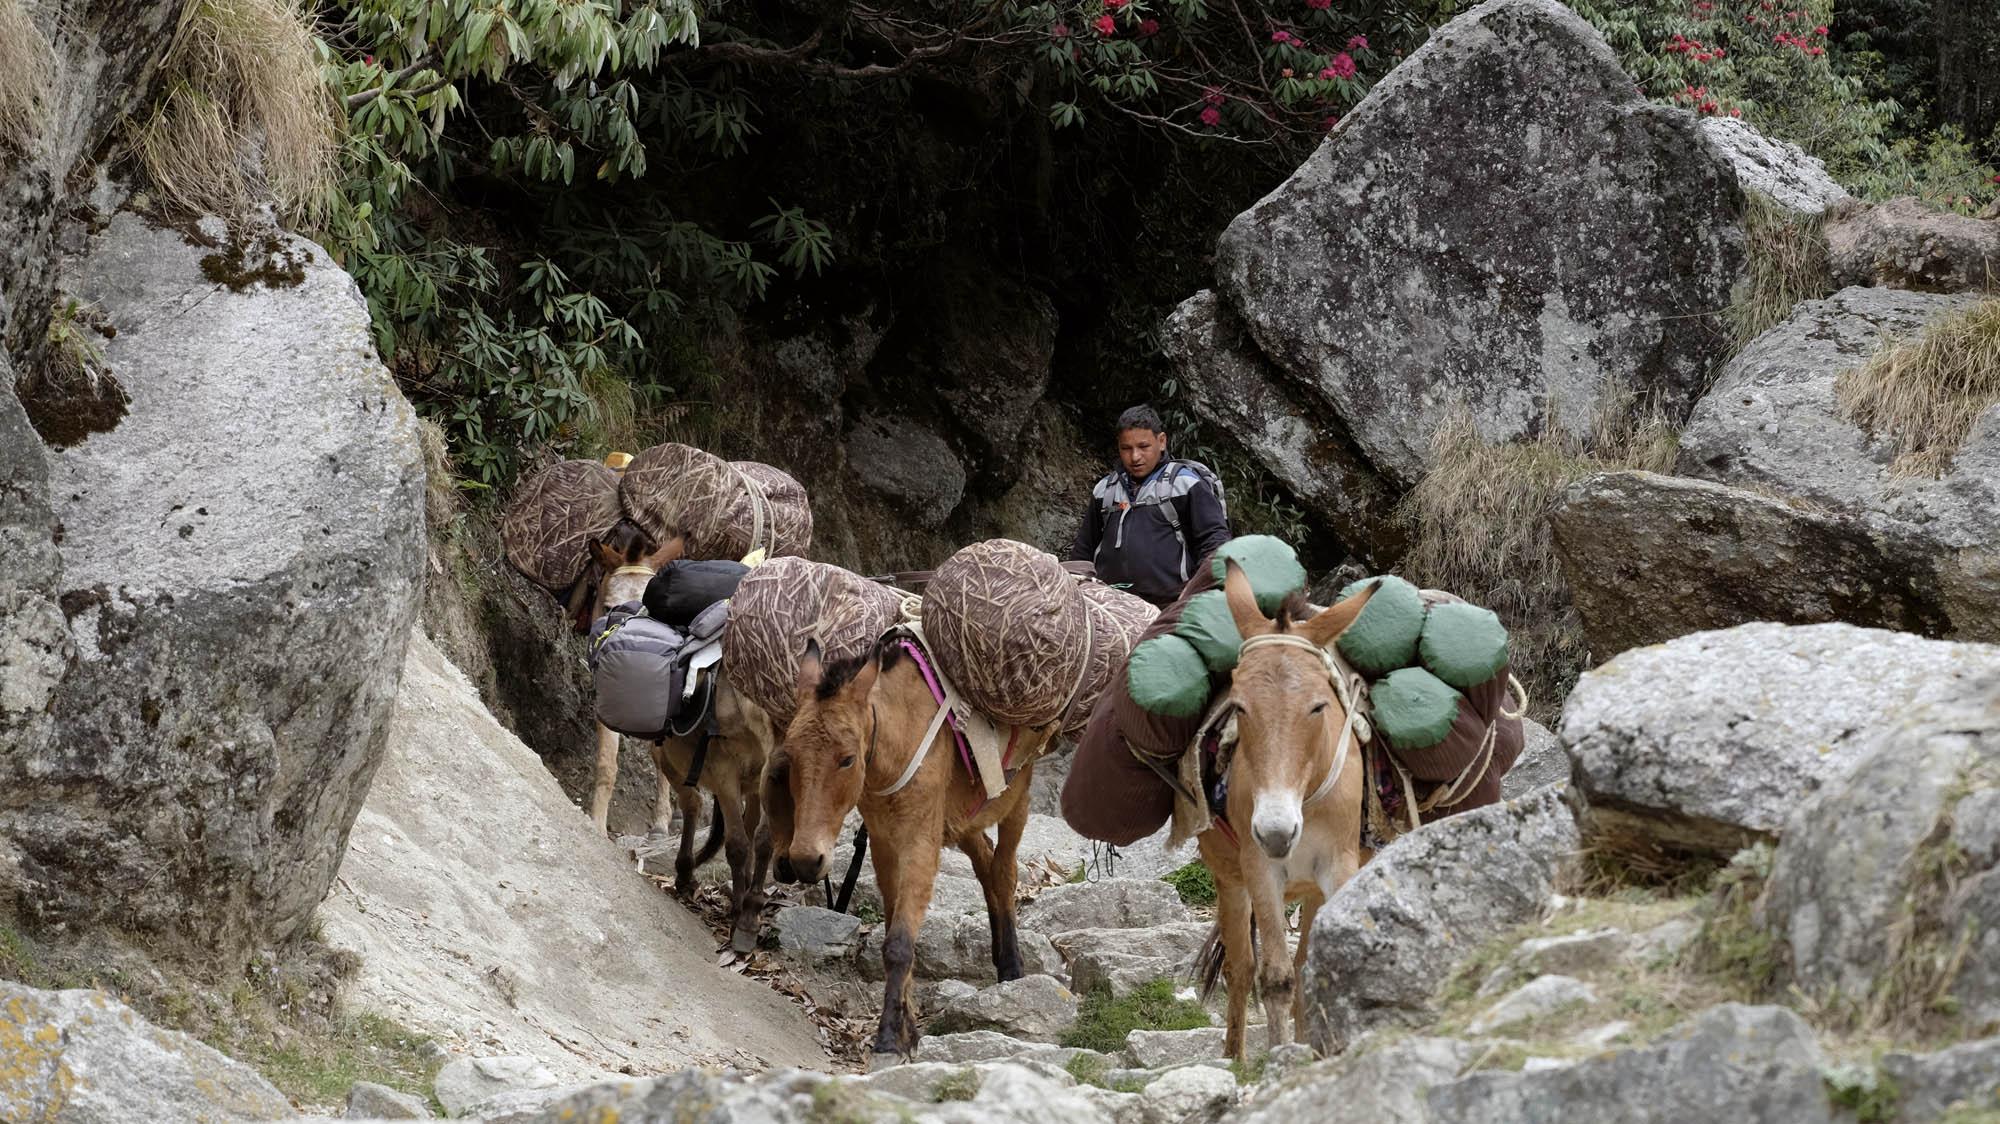 reise-ansichten Himalaya Maultiere